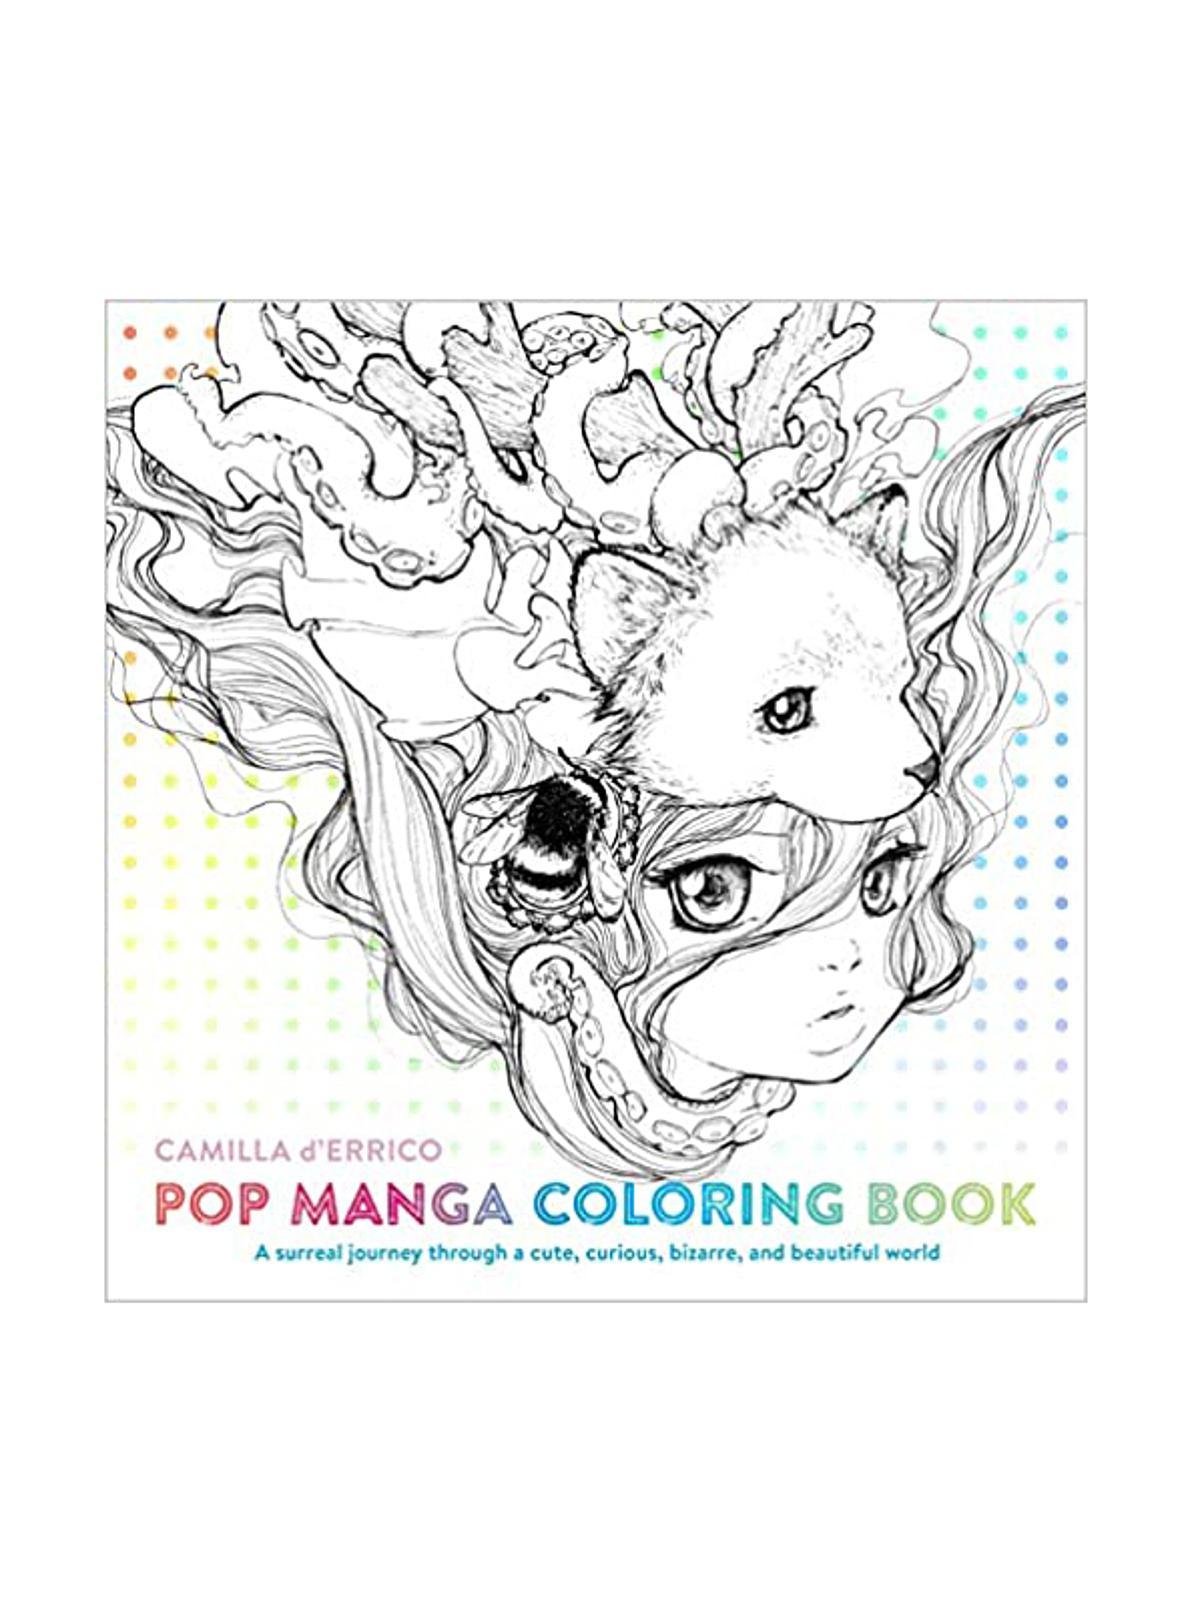 Watson-Guptill - Pop Manga Coloring Book